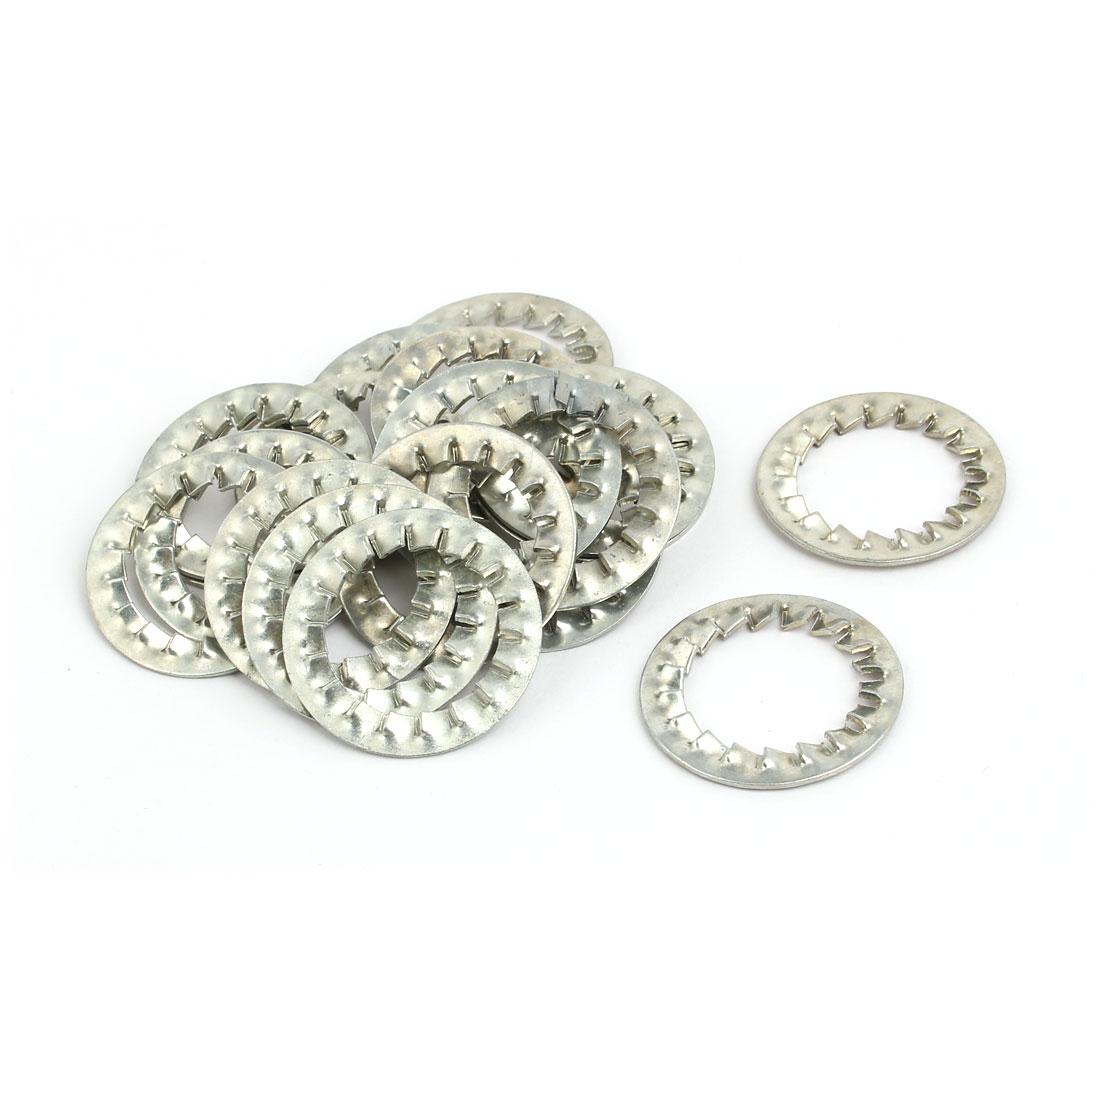 20mm Inner Dia Carbon Steel Zinc Plated Internal Serrated Lock Washer 20pcs